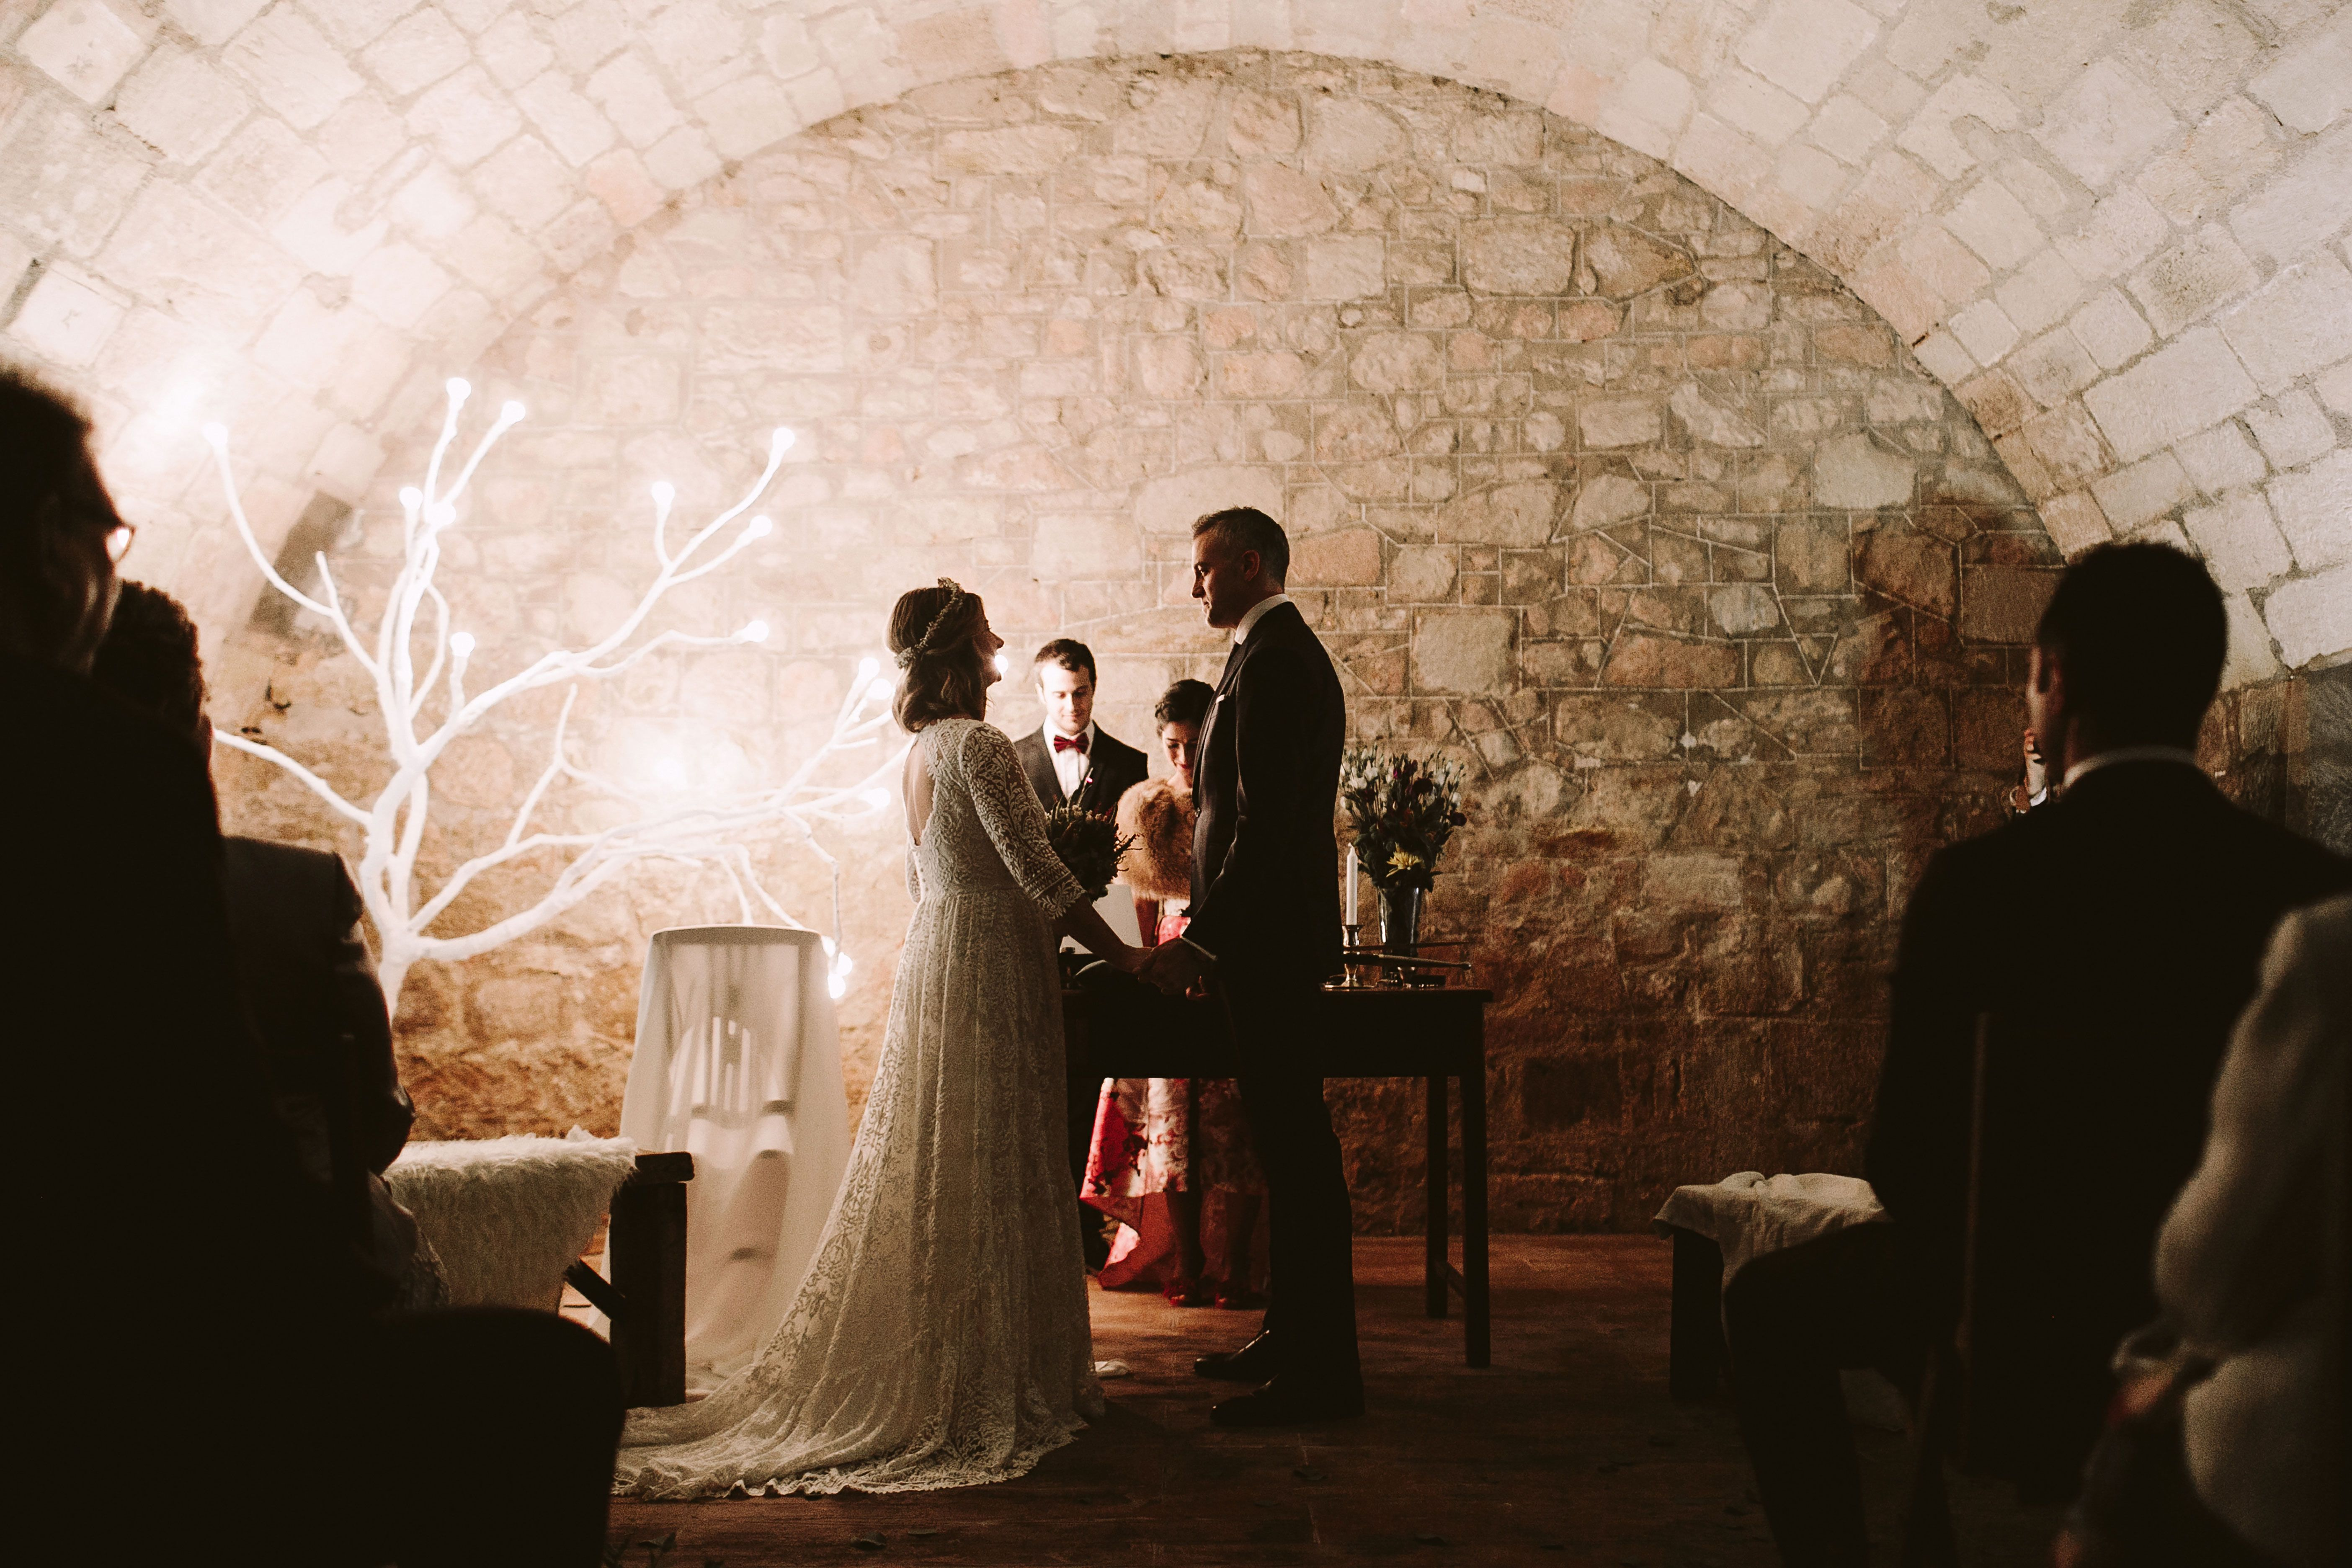 Bereziboda Ide y Rubén Berezi Moments Ceremonia Alicia Rueda Atelier Scalpers Company, Monasterio del Espino